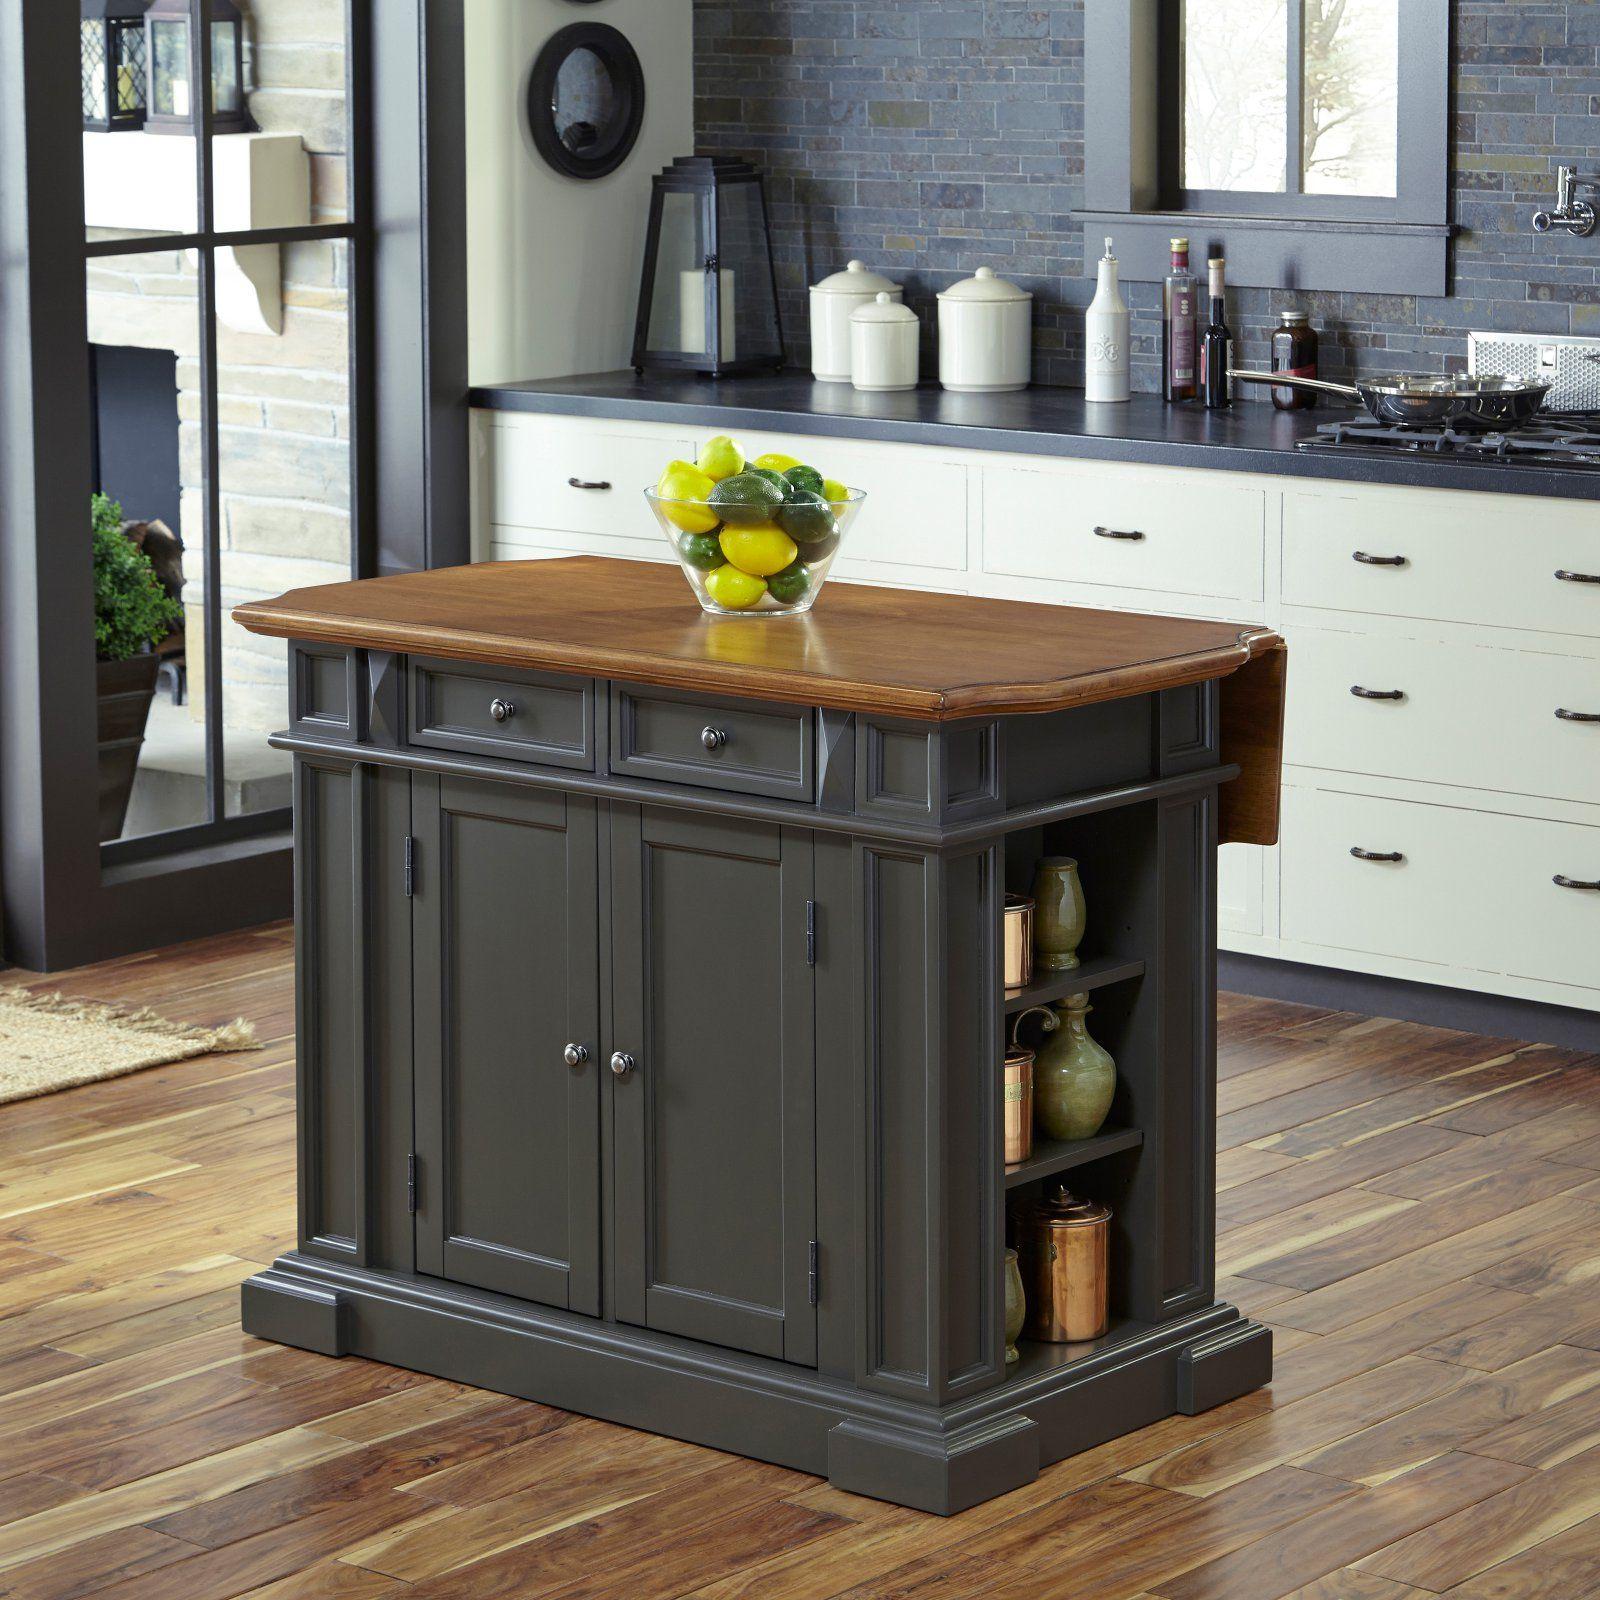 Home Styles Americana Kitchen Island Gray Grey Kitchen Island Kitchen Island Table Americana Kitchen